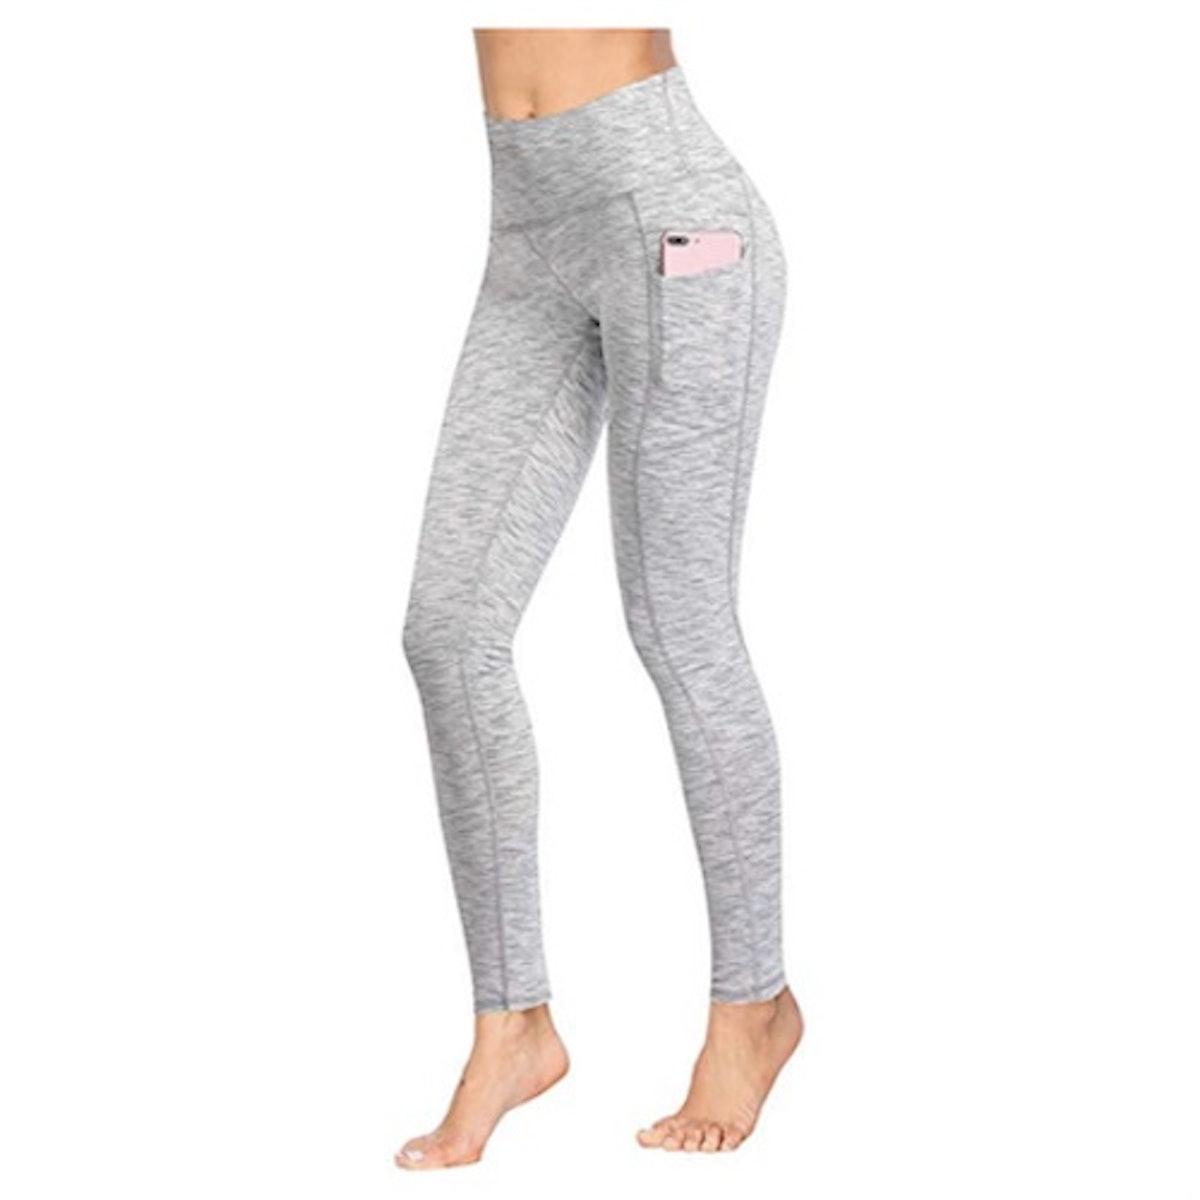 Fengbay High Waist Yoga Pants